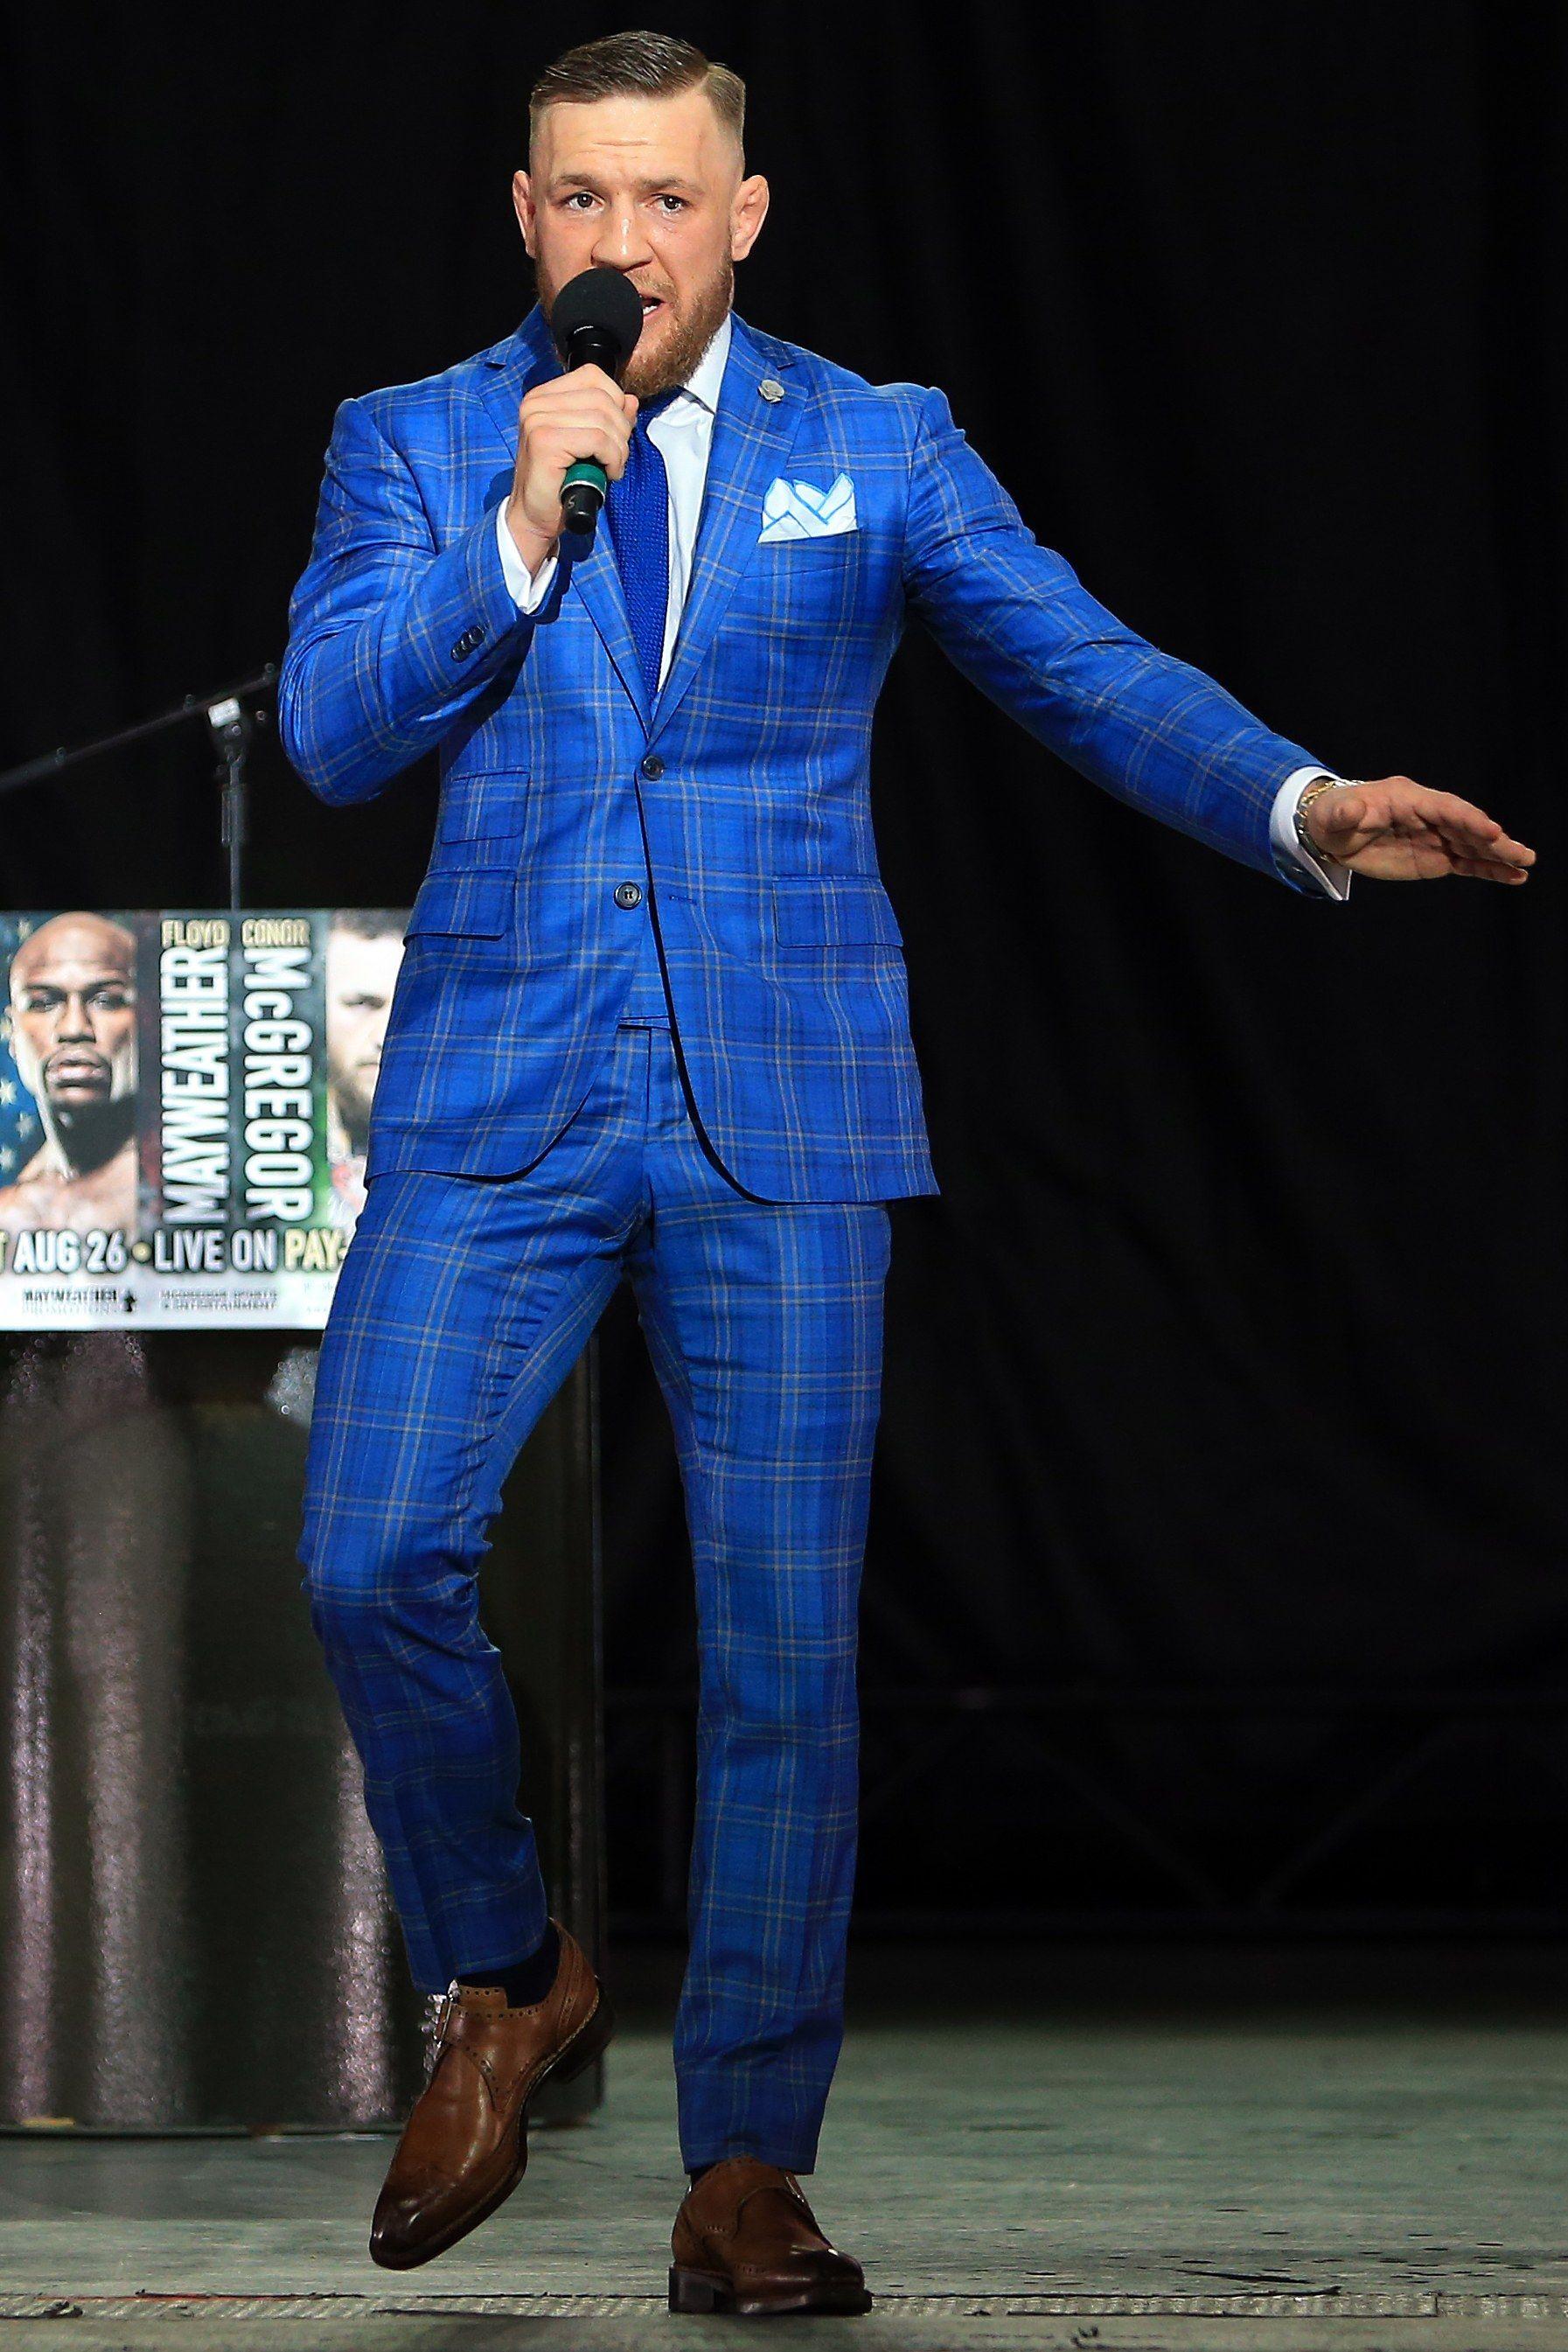 368afd99037086 The 10 Best-Dressed Men of the Week 7.17.17 | Conor McGregor | Blue ...